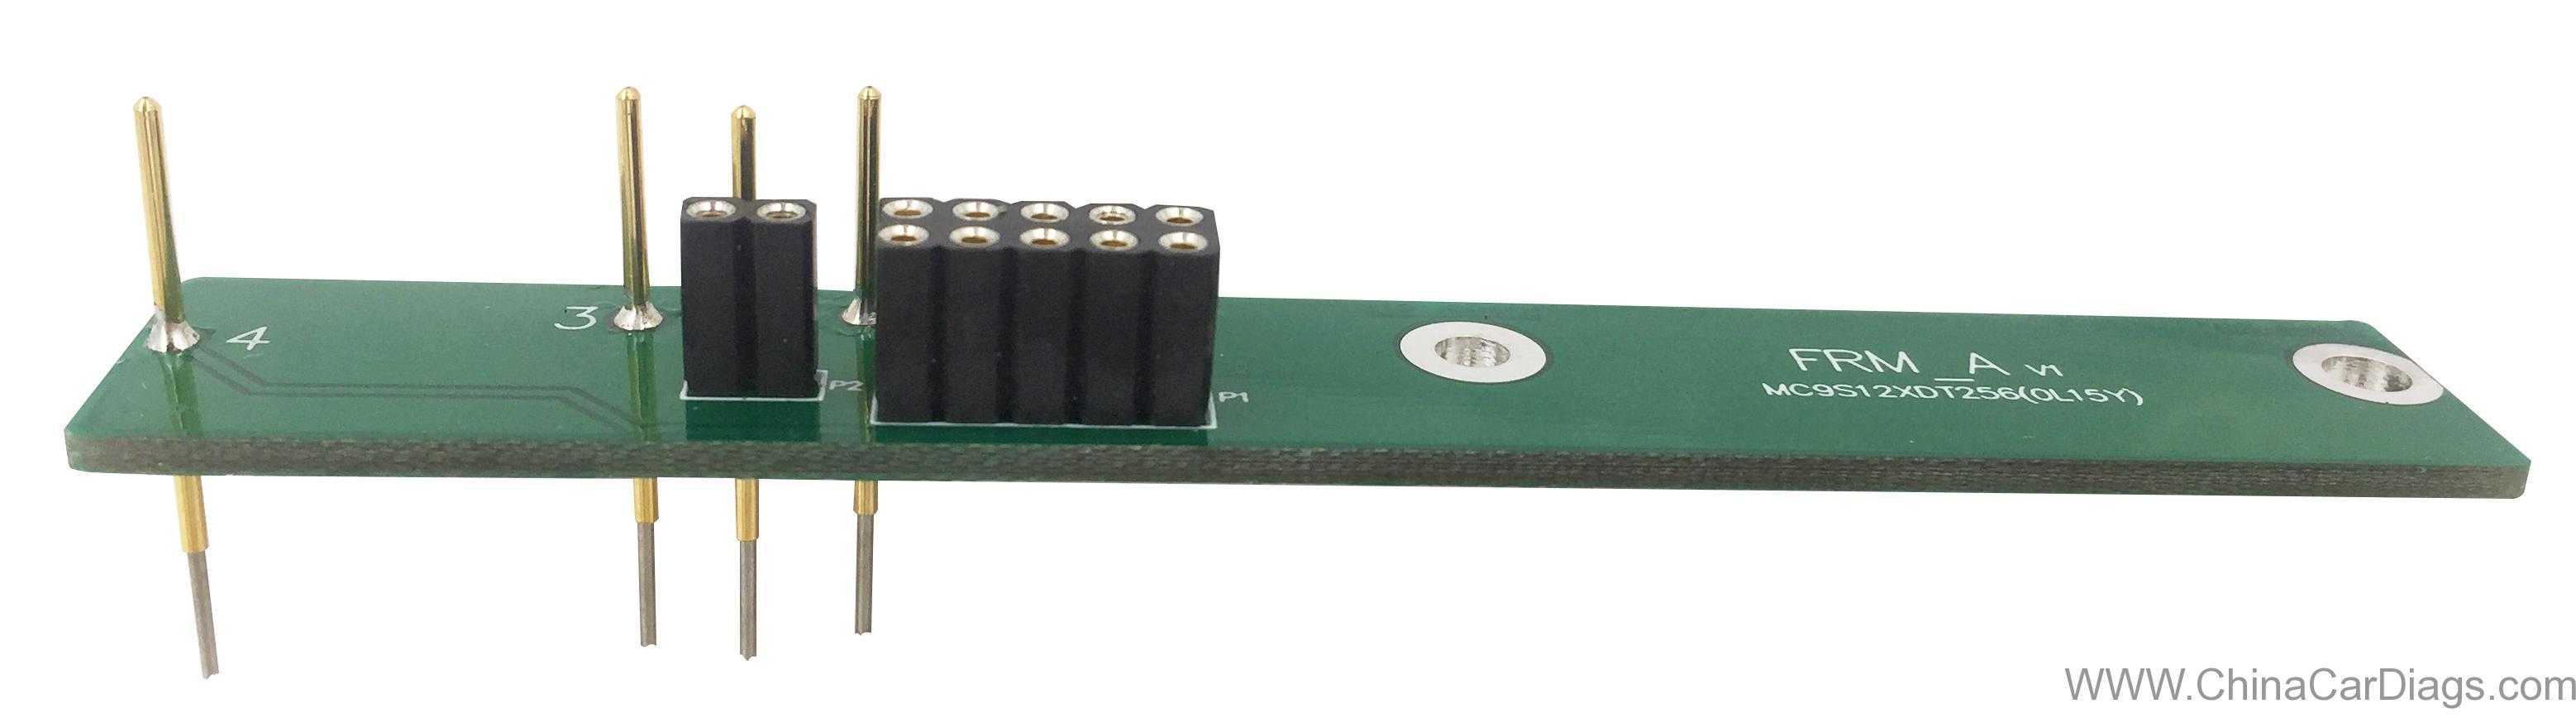 yanhua-acdp-module-8-1